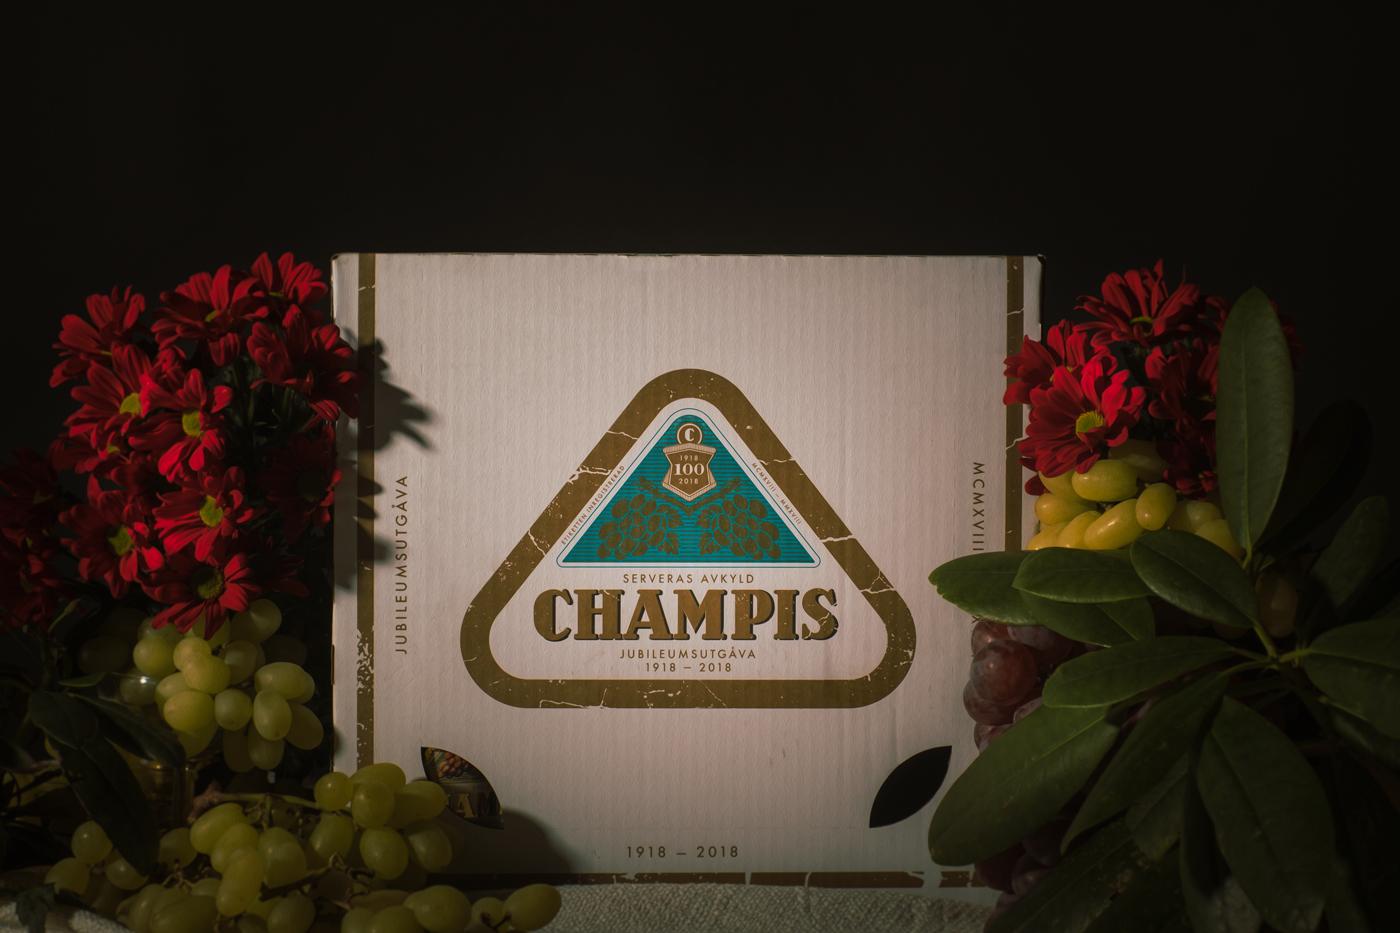 Champis_box_4